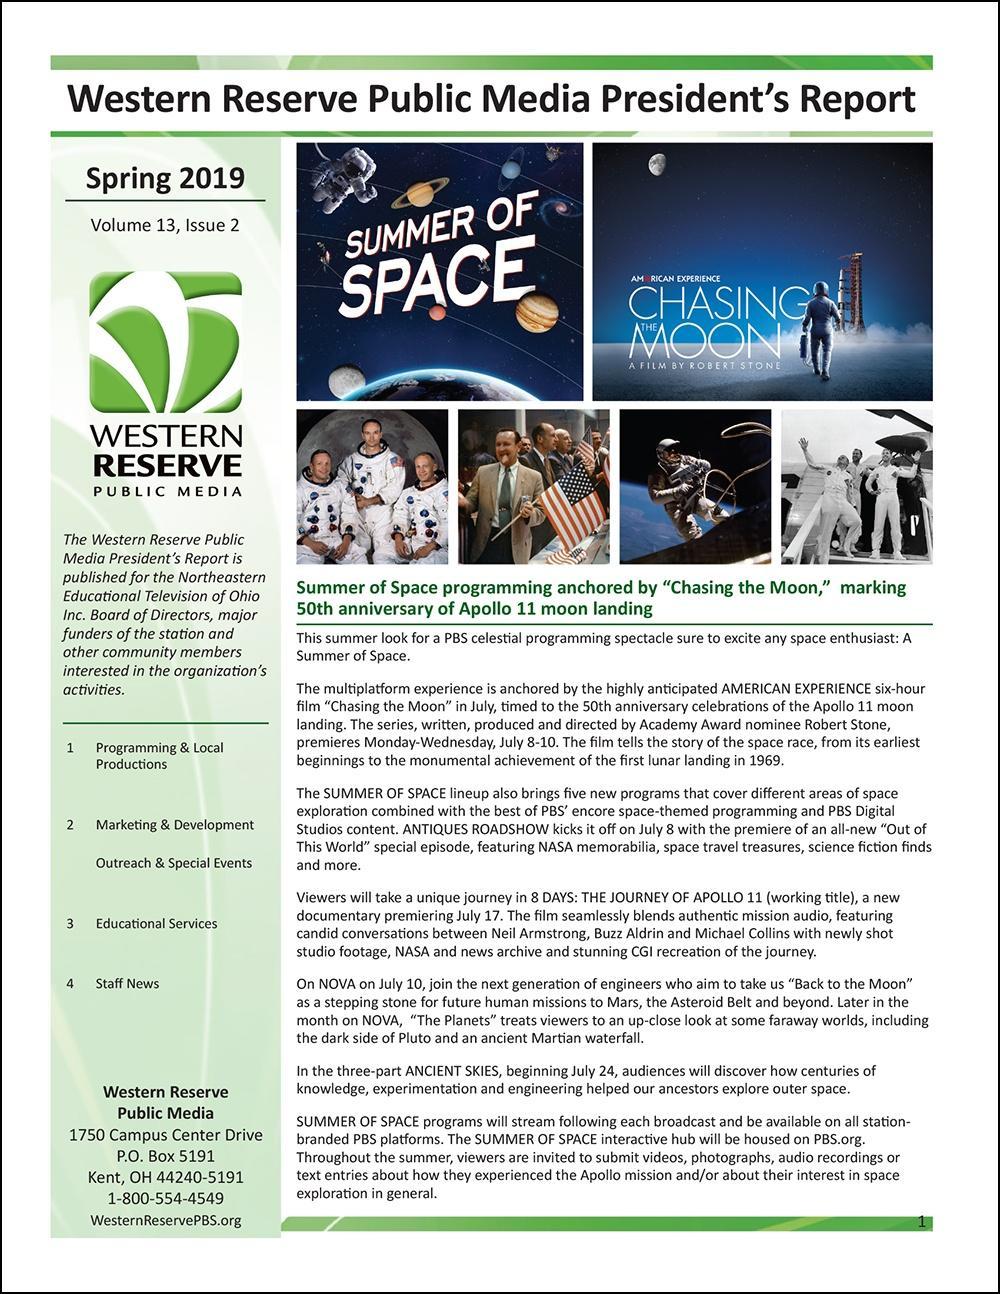 Spring 2019 - Volume 13, Issue 2